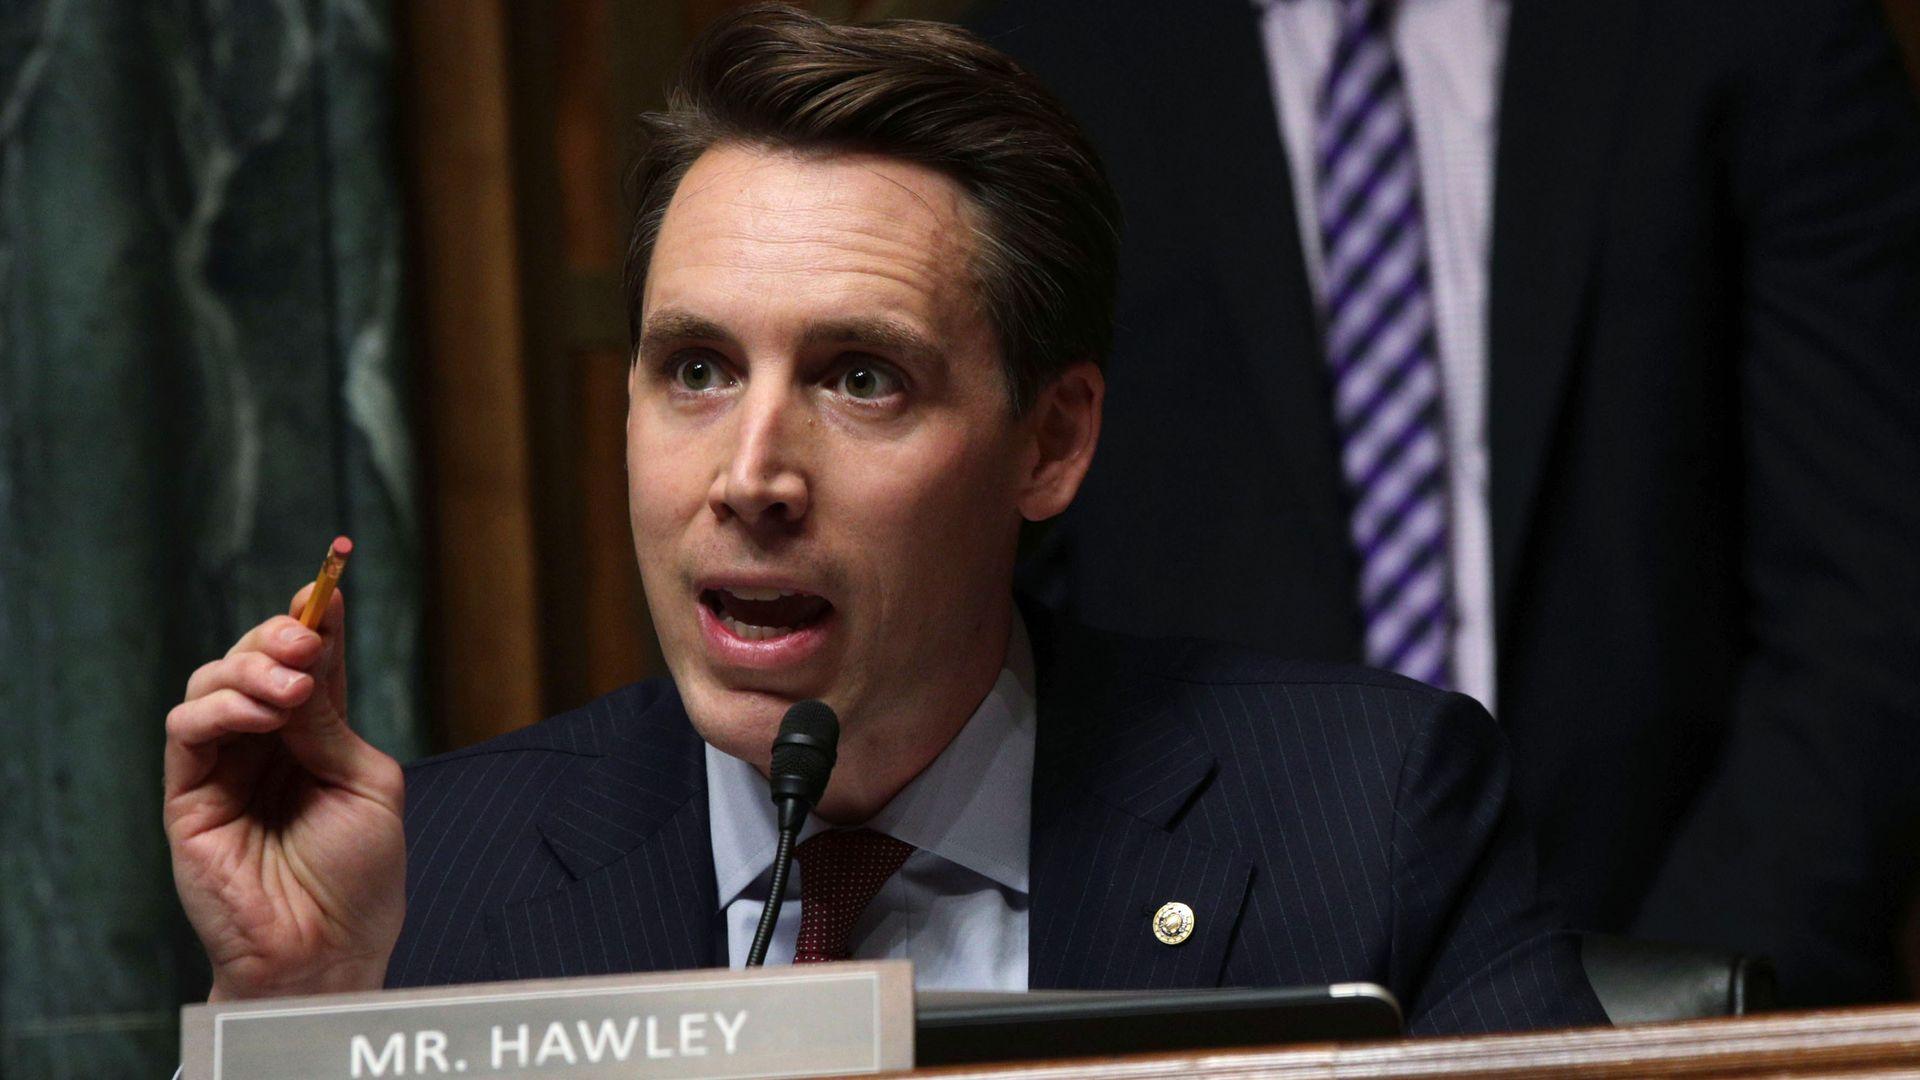 Senator Josh Hawley speaks during a hearing